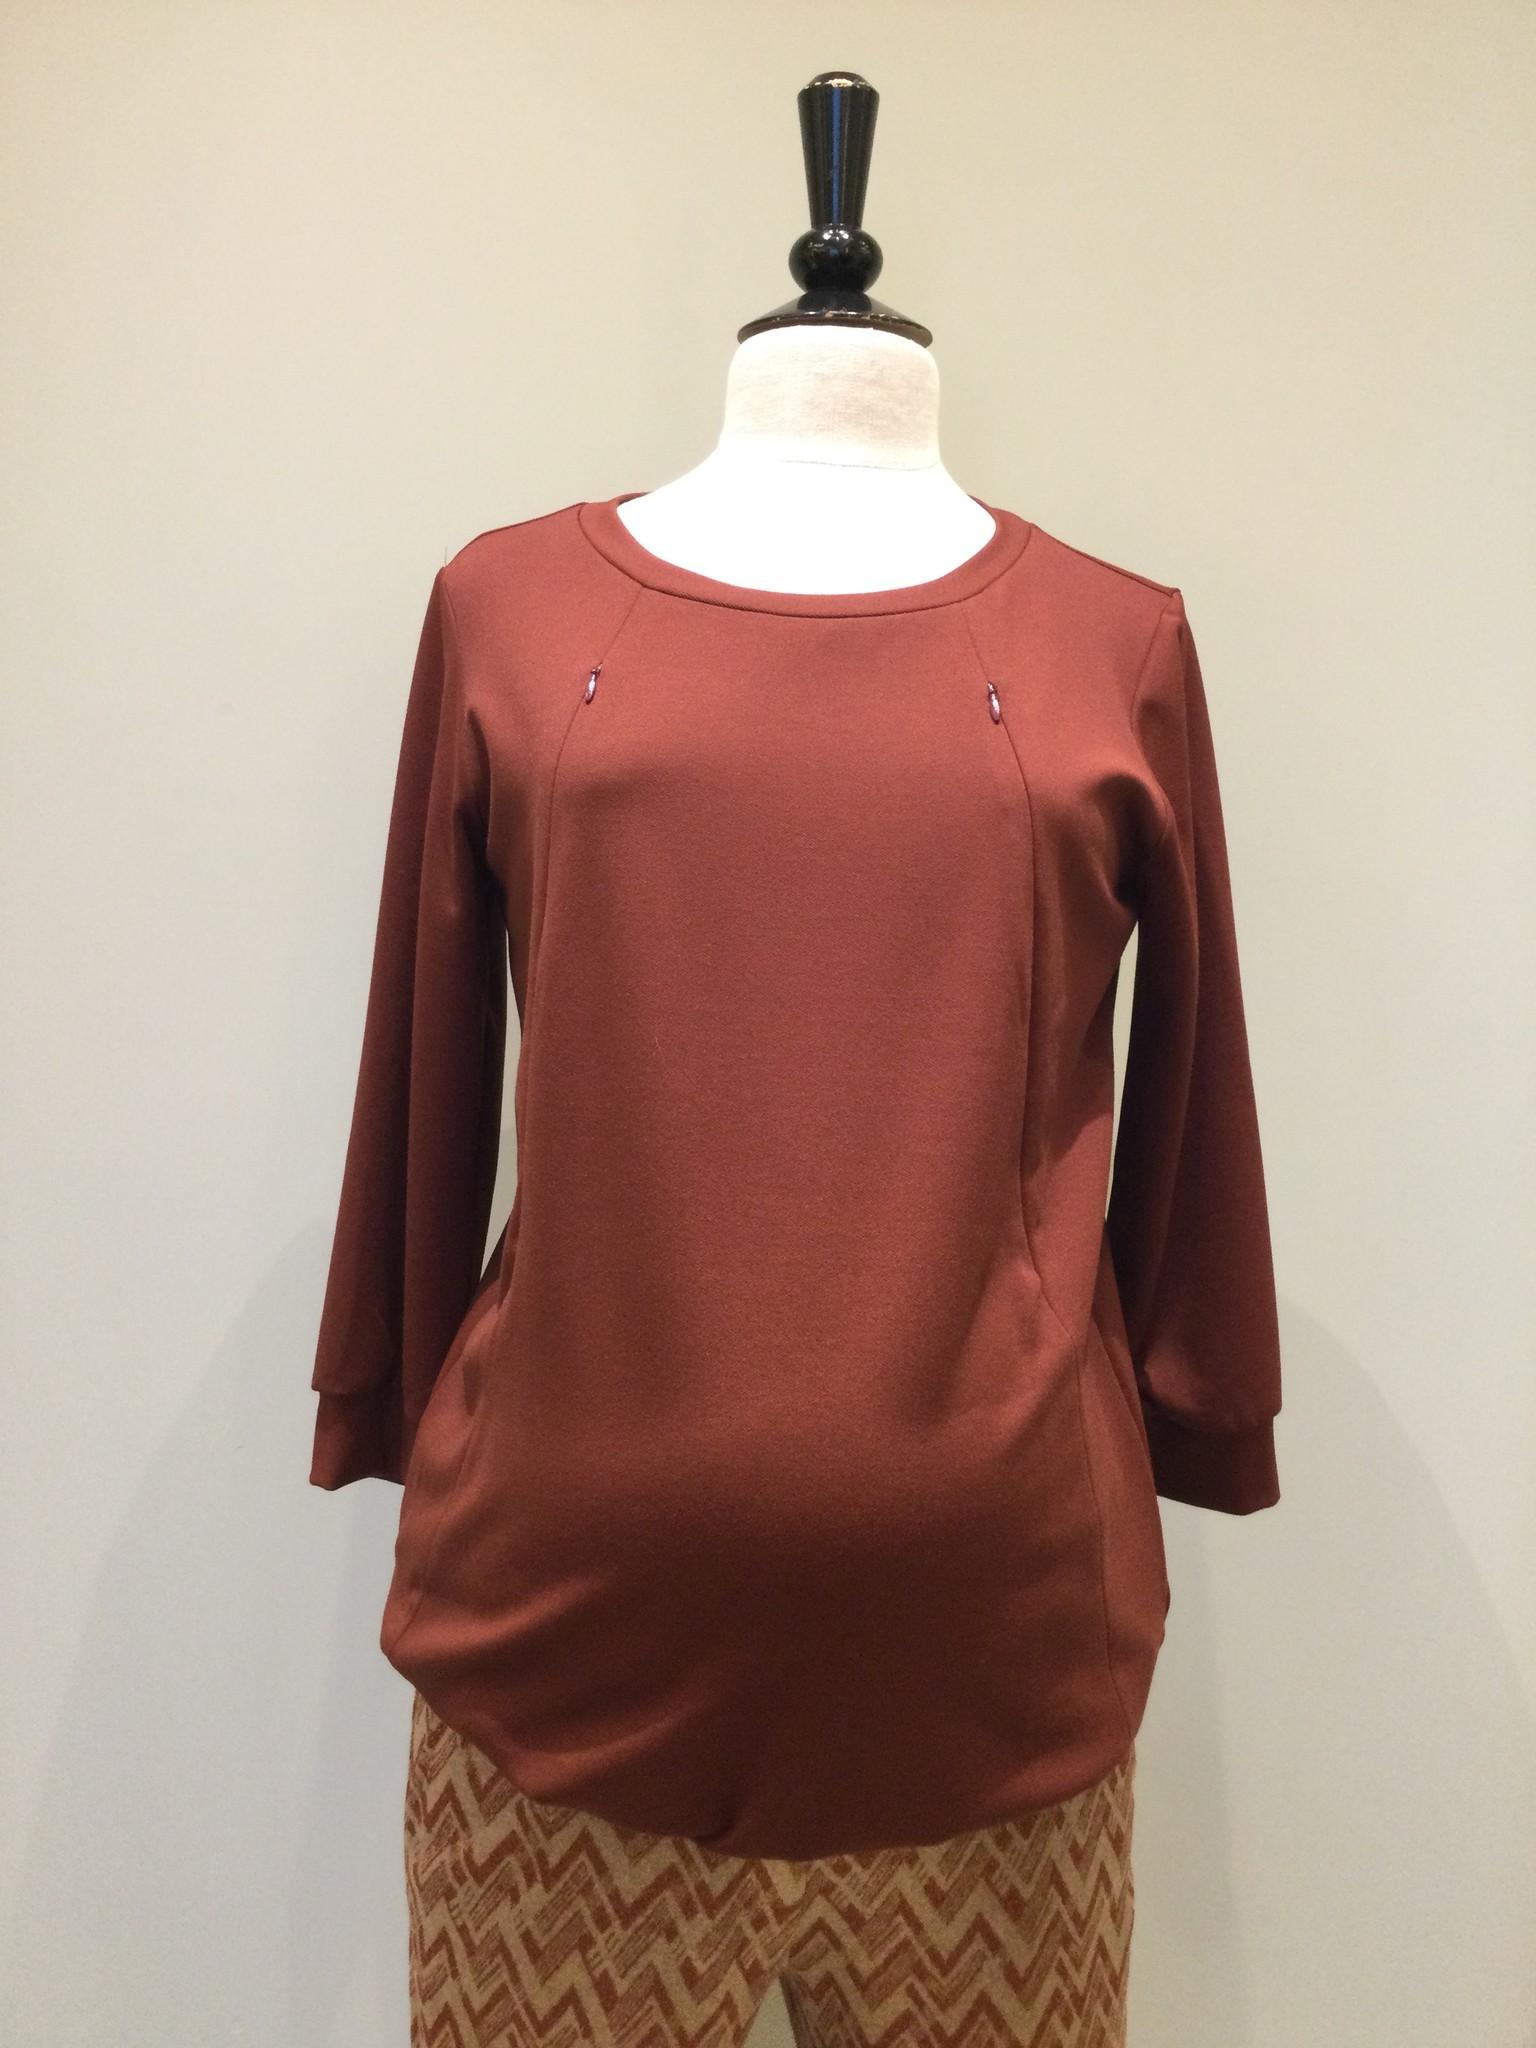 Zip sweater - keramic-1